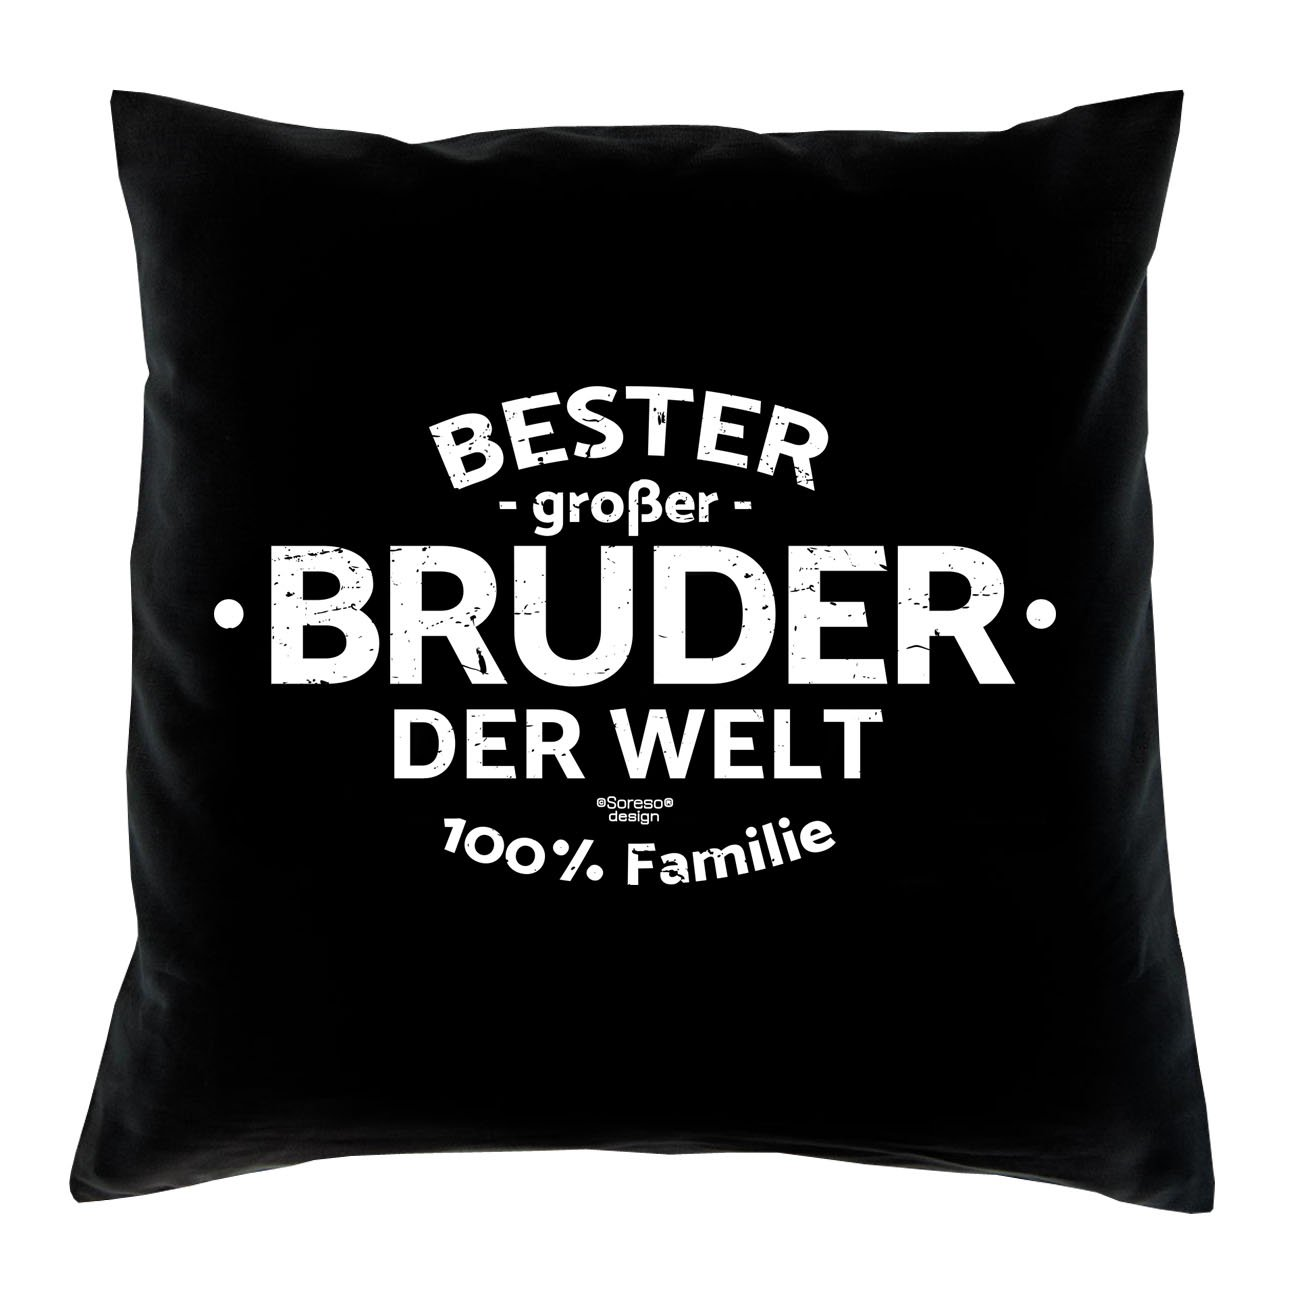 Geschenk-Set : Bester großer Bruder der Welt - Kissen inkl. Füllung ...